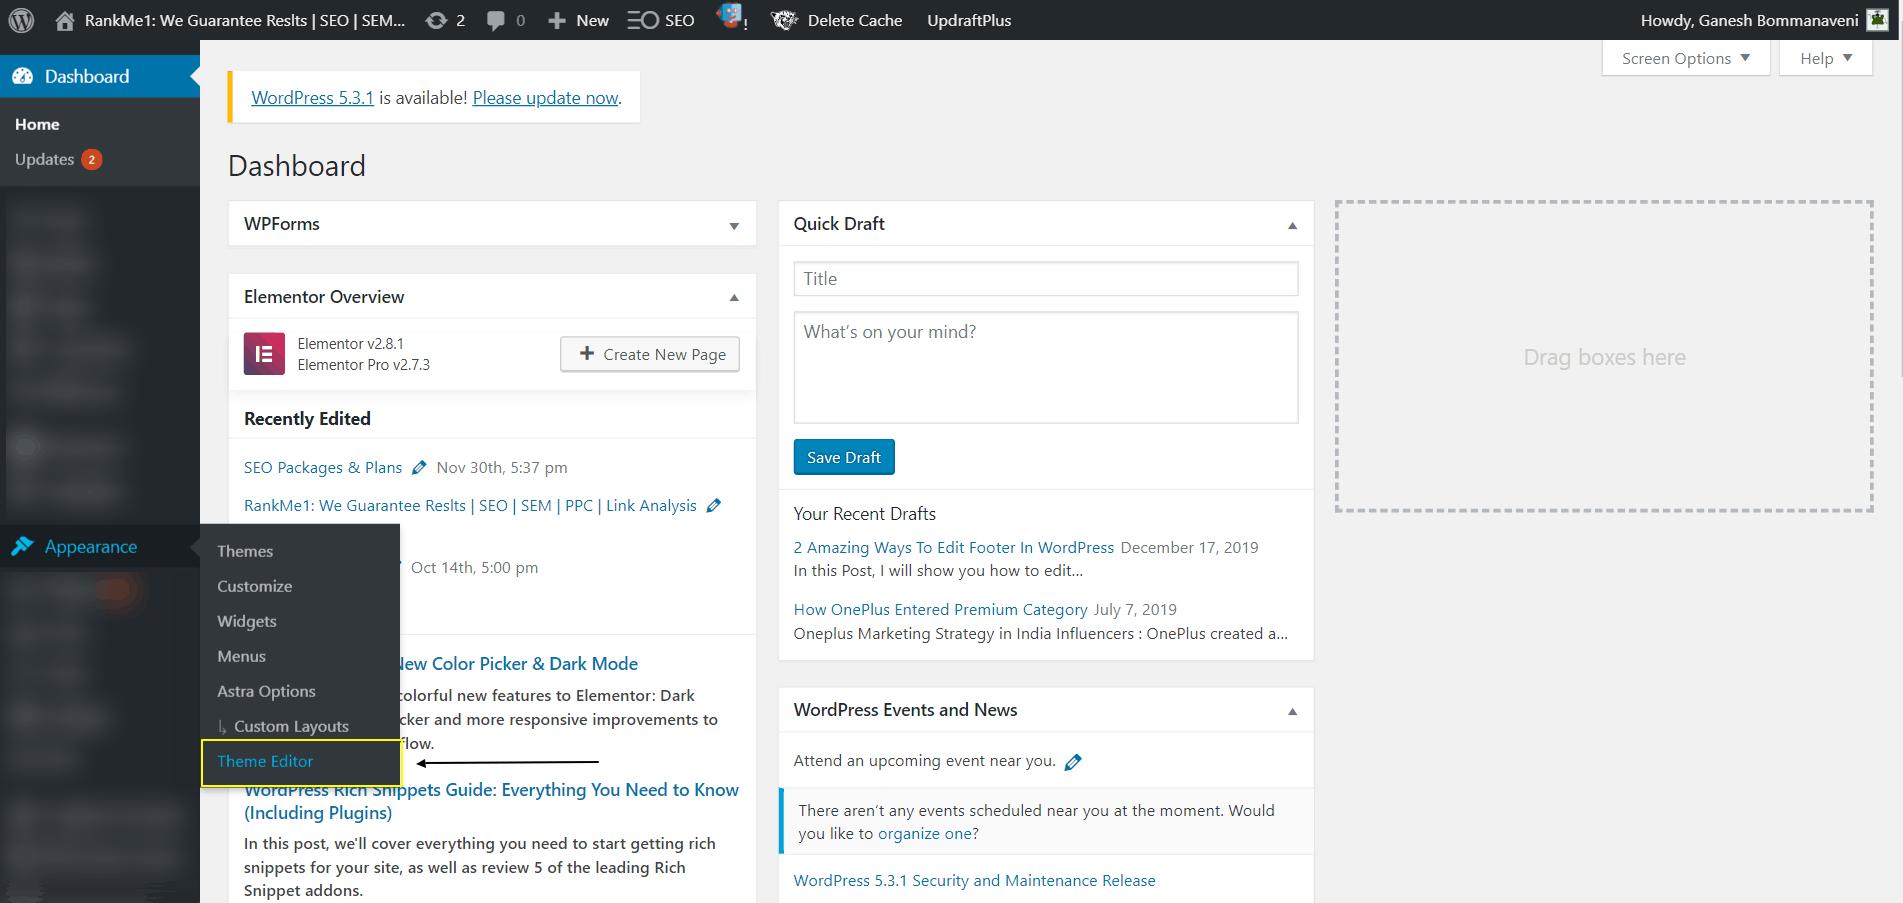 Screenshot Showing The Theme Editor Option In WordPress